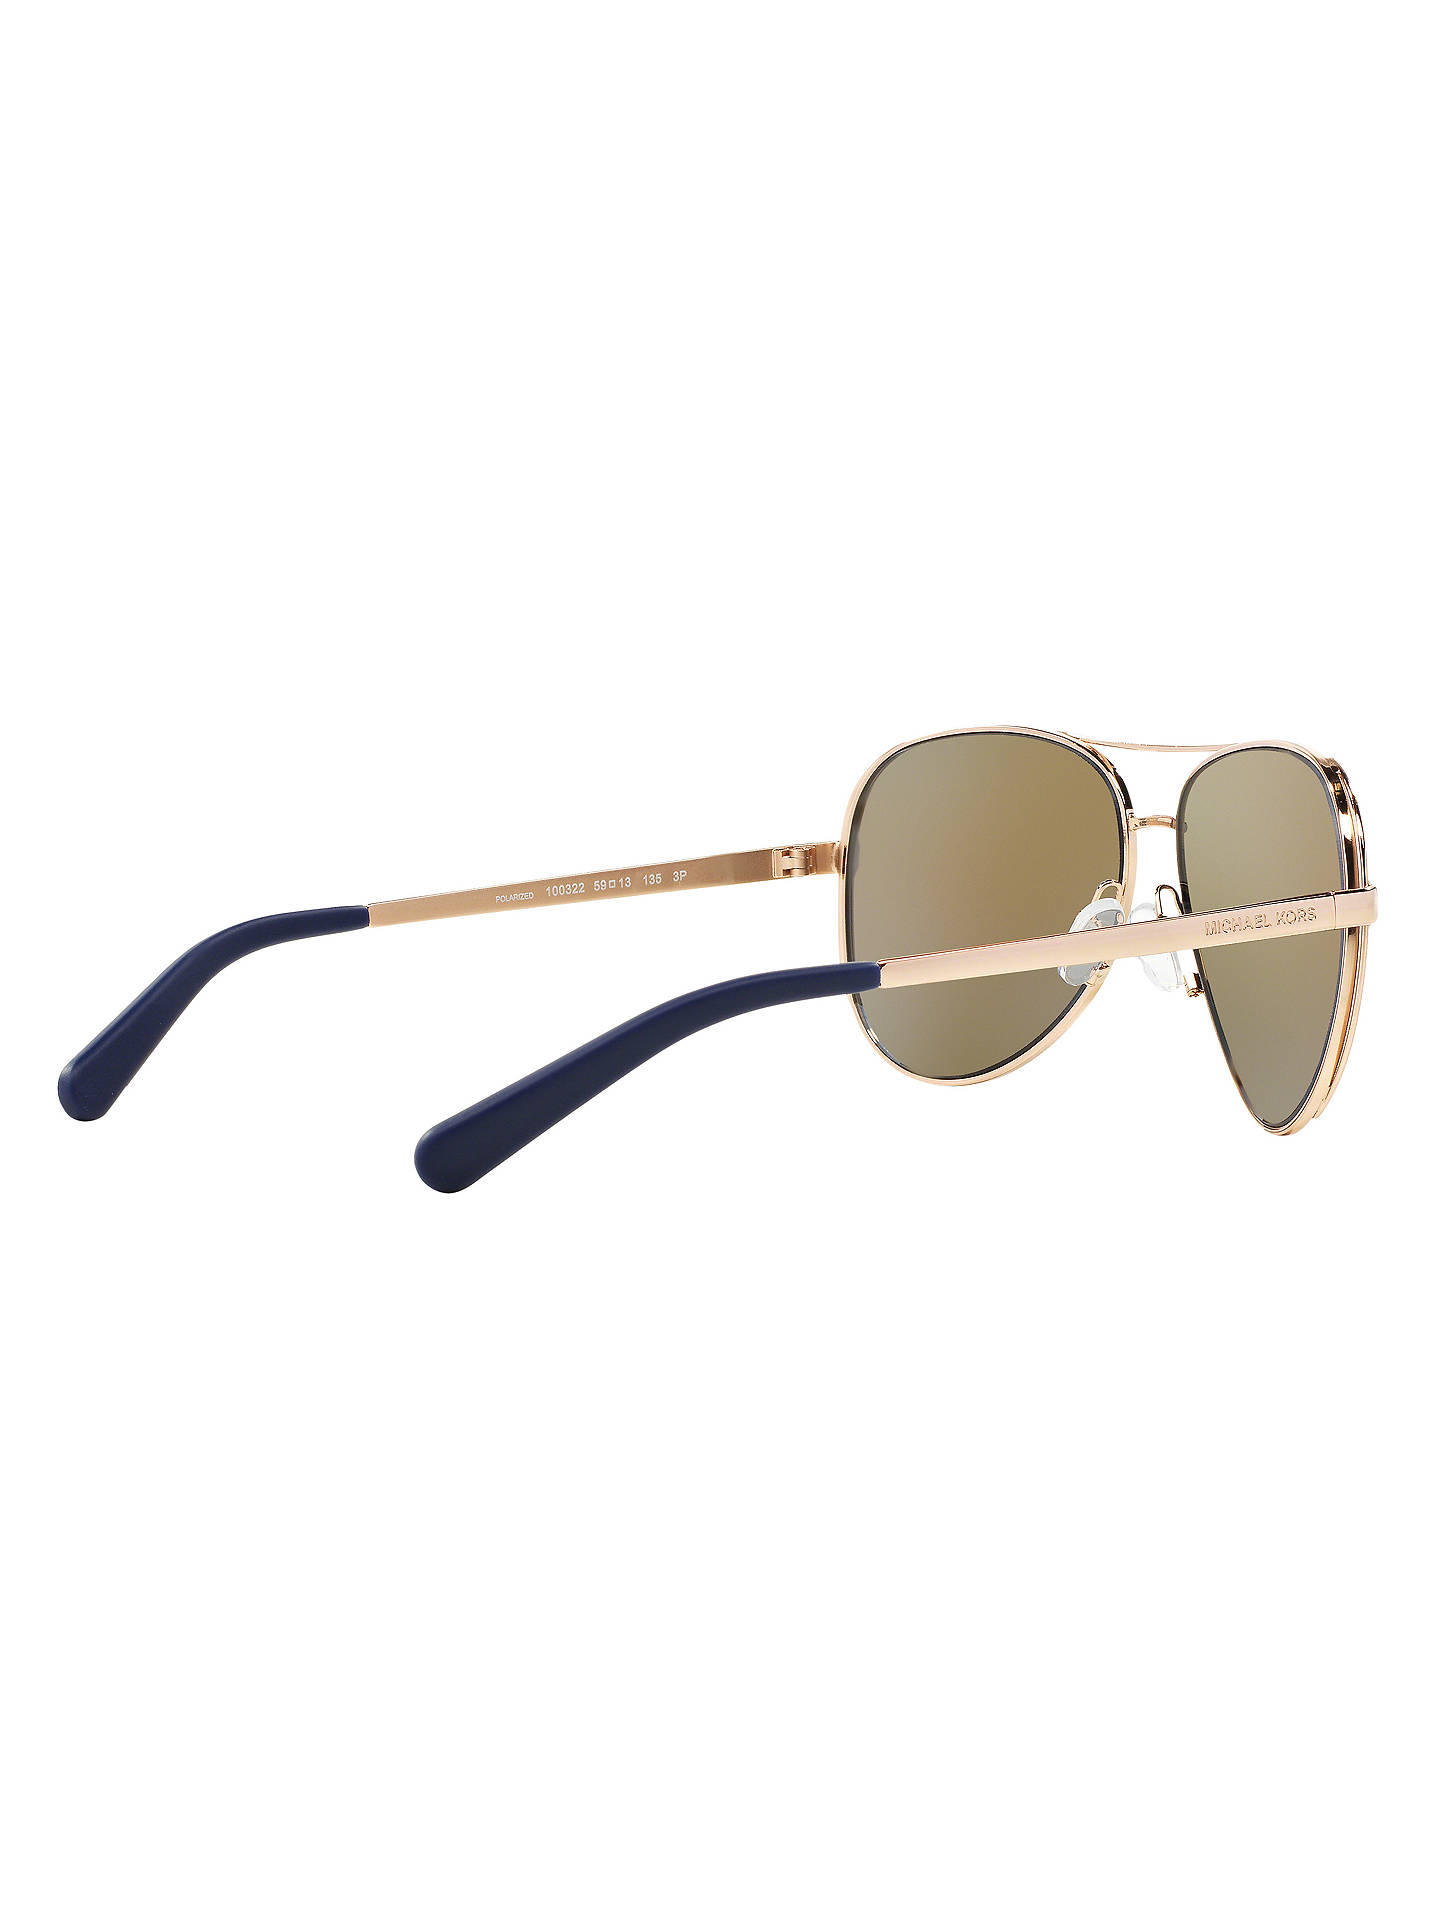 050fb85fc9 Michael Kors MK5004 Chelsea Polarised Aviator Sunglasses at John ...